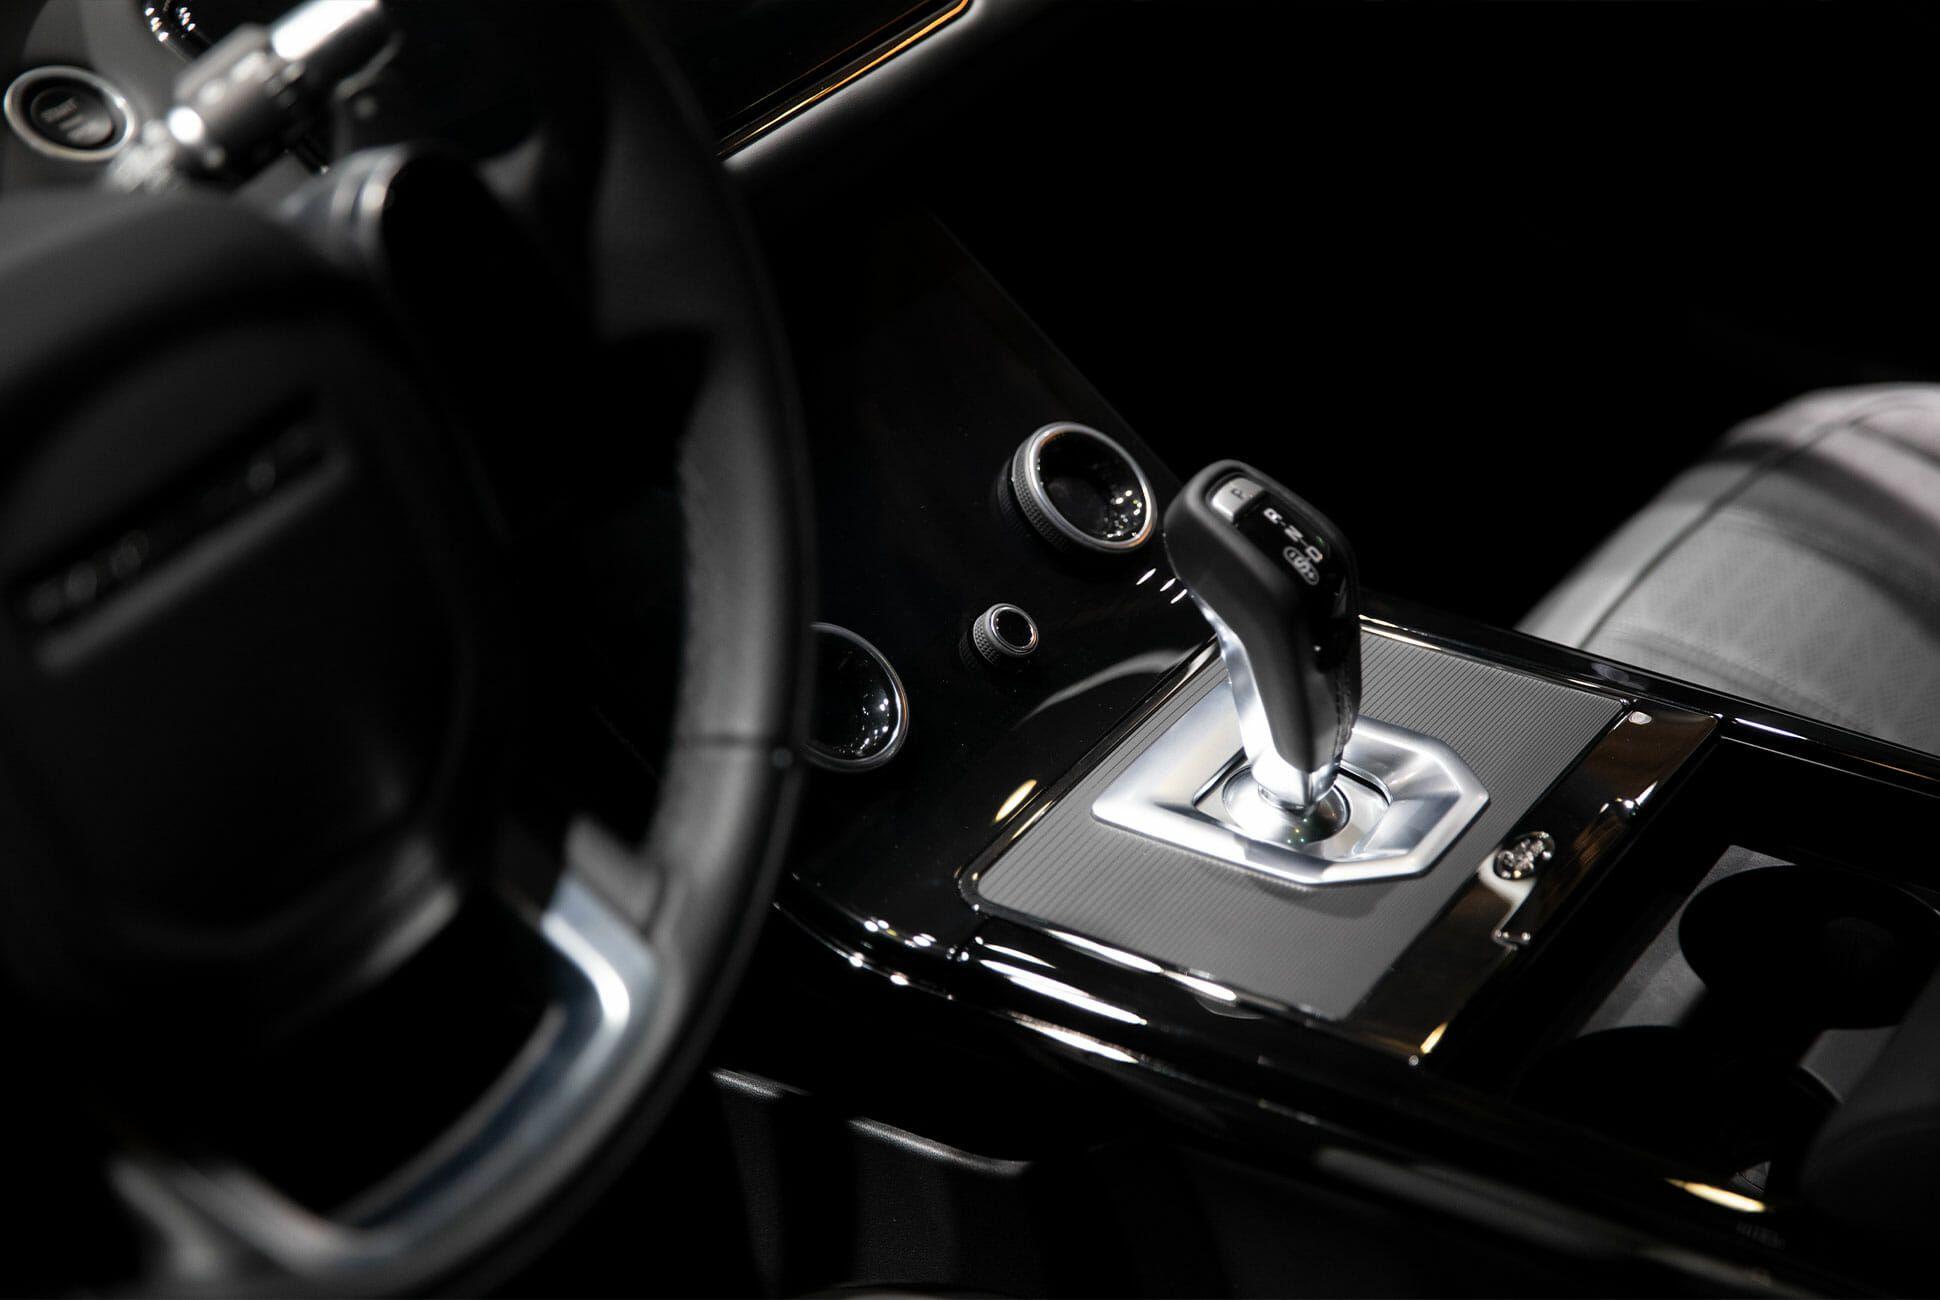 NYIAS-Details-Gear-Patrol-Velar-Slide-2